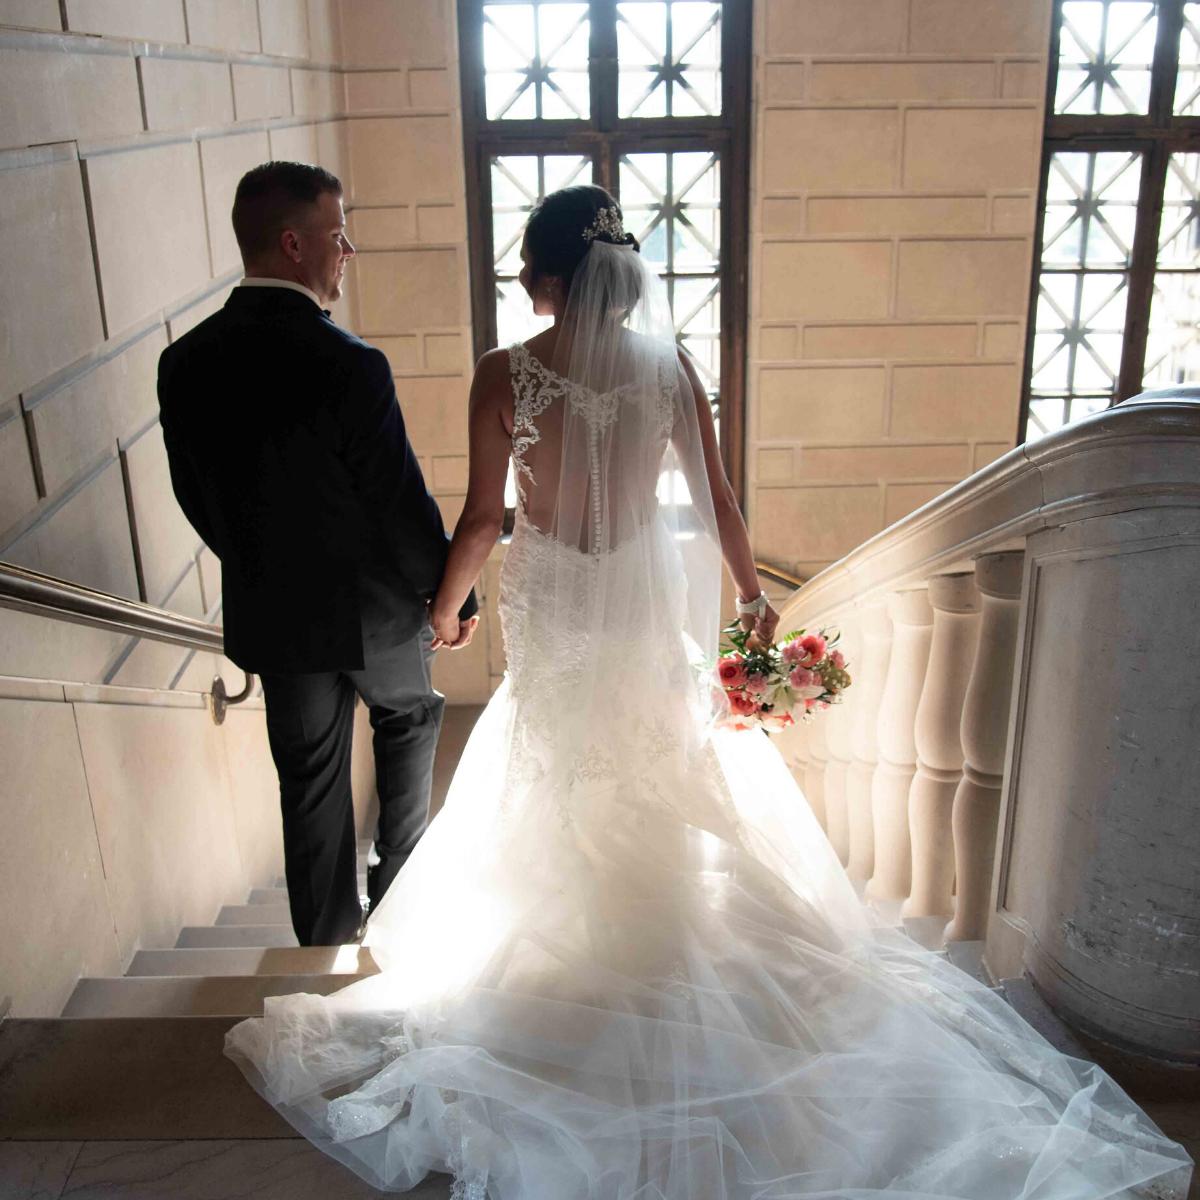 Wedding Photo LA Images